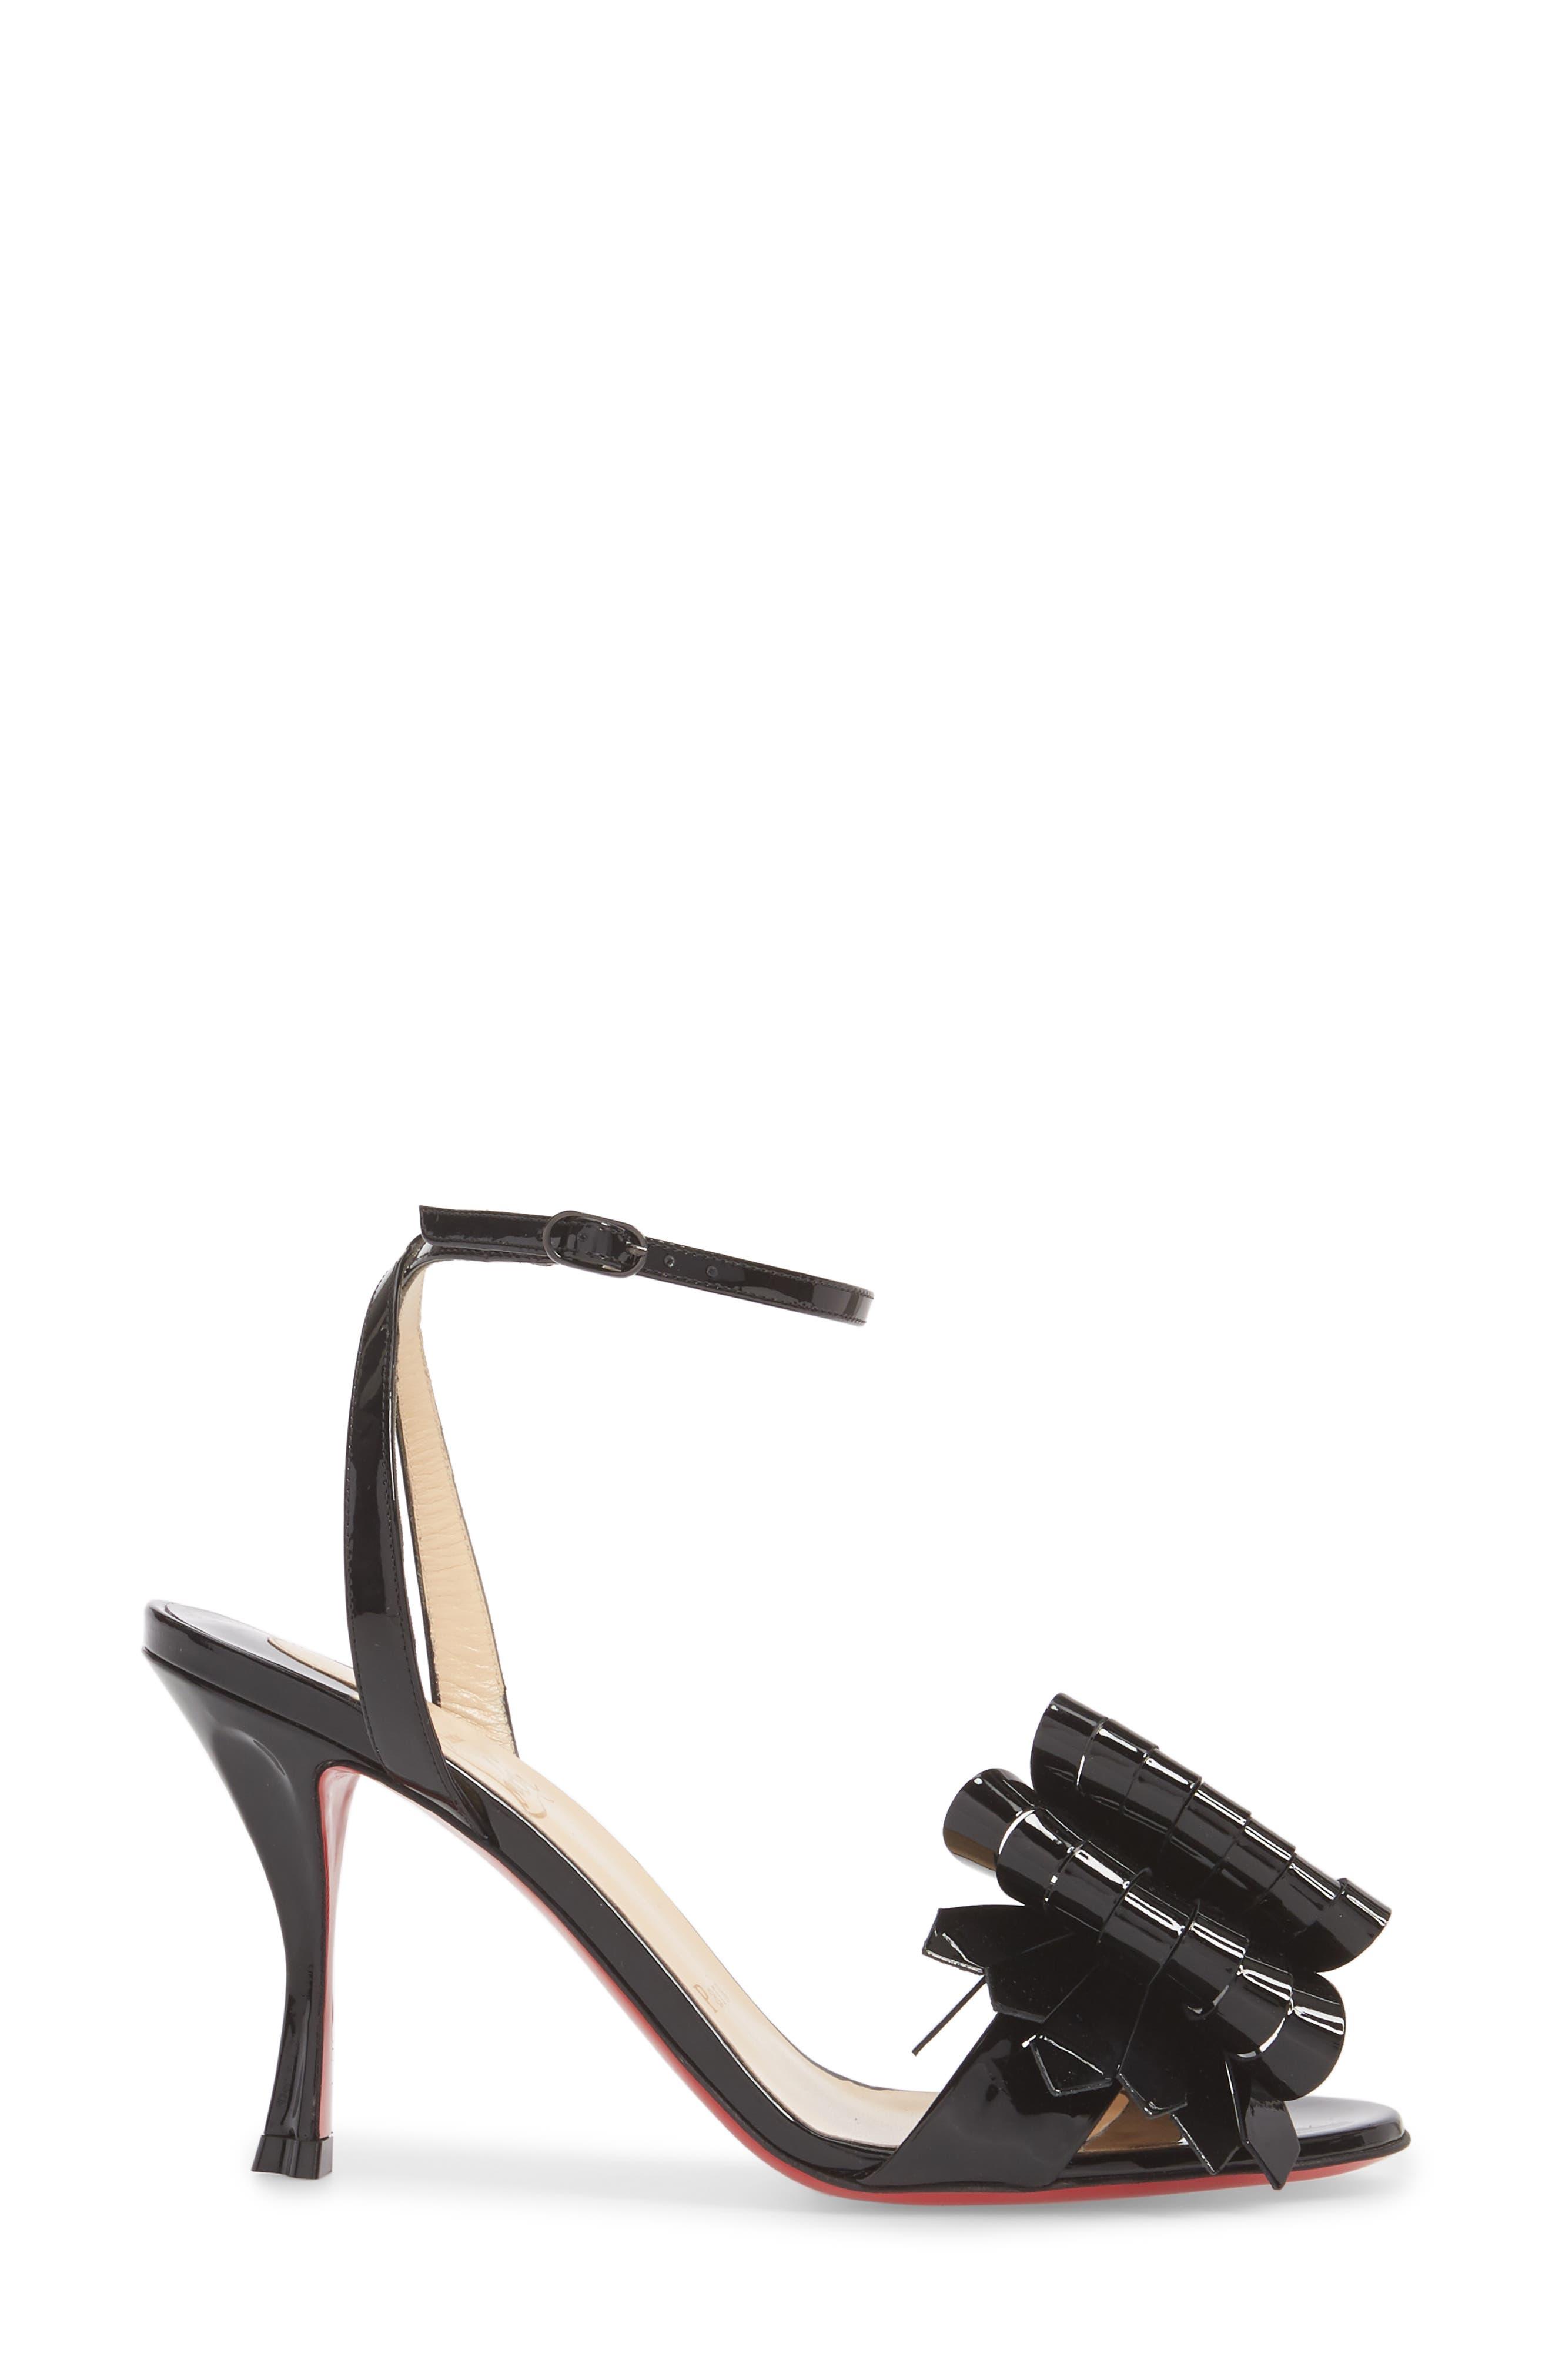 Miss Valois Bow Ankle Strap Sandal,                             Alternate thumbnail 5, color,